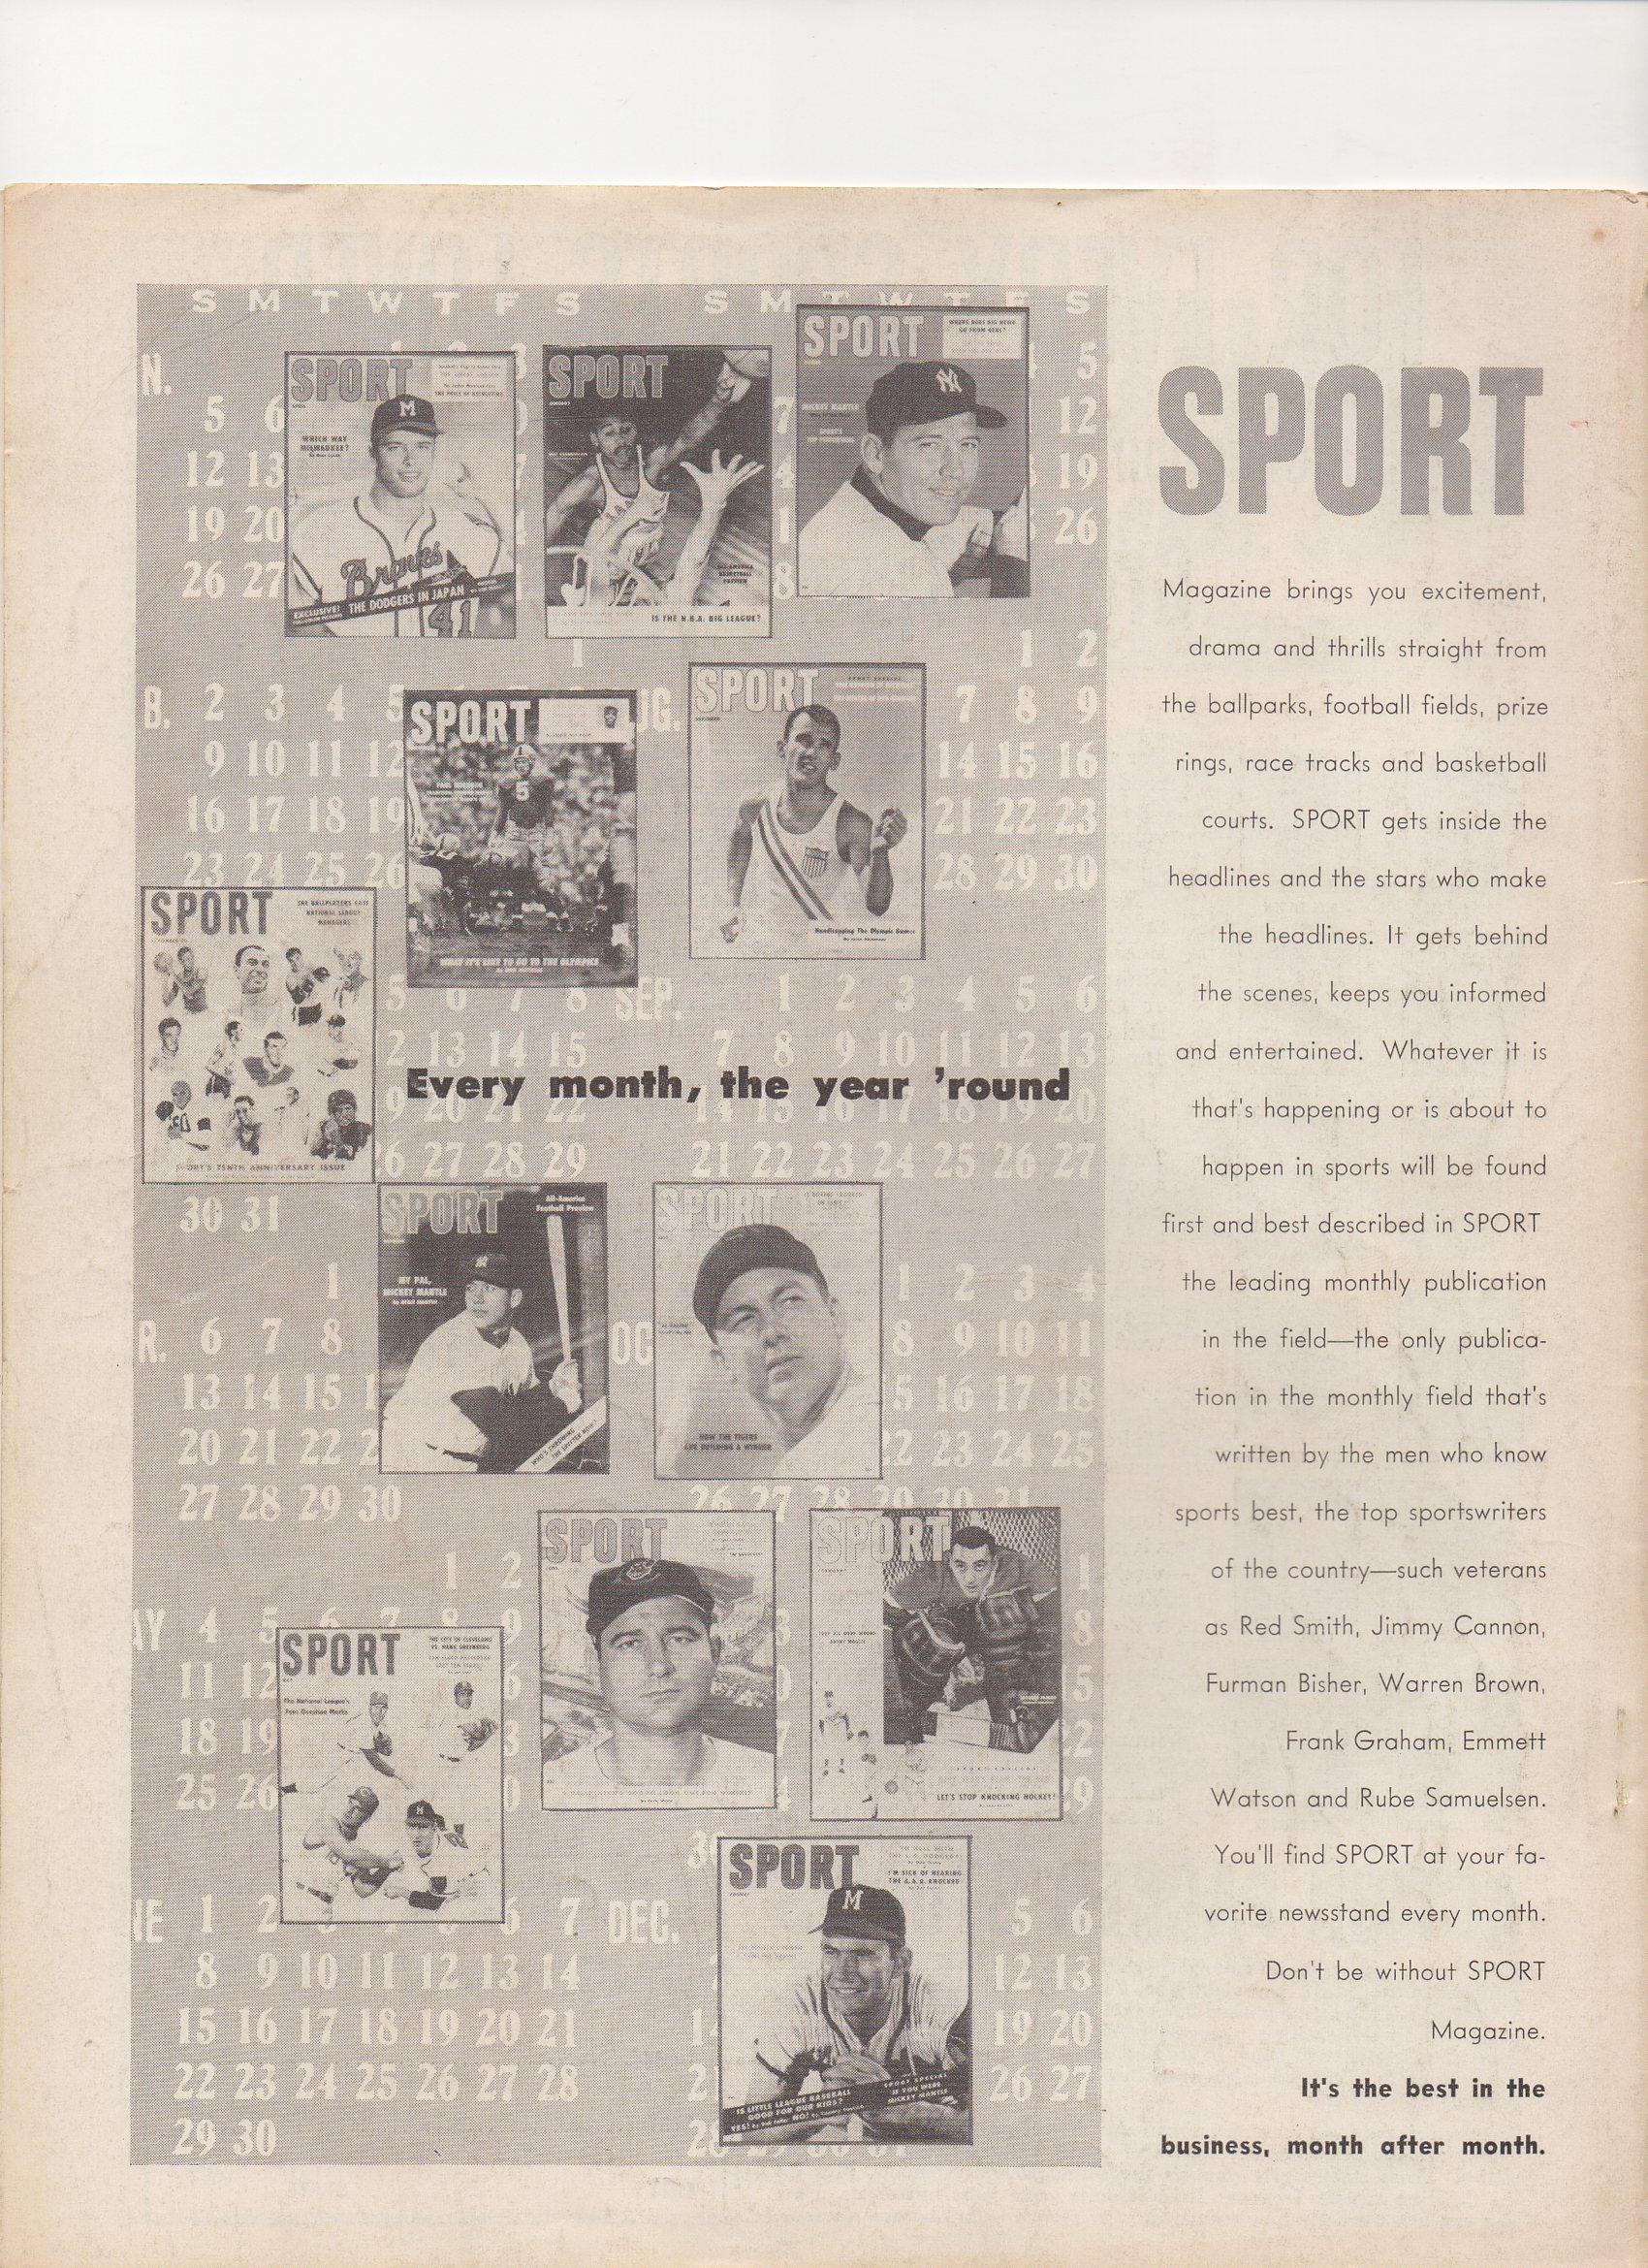 1958 baseball all stars, bartholomew house inc.